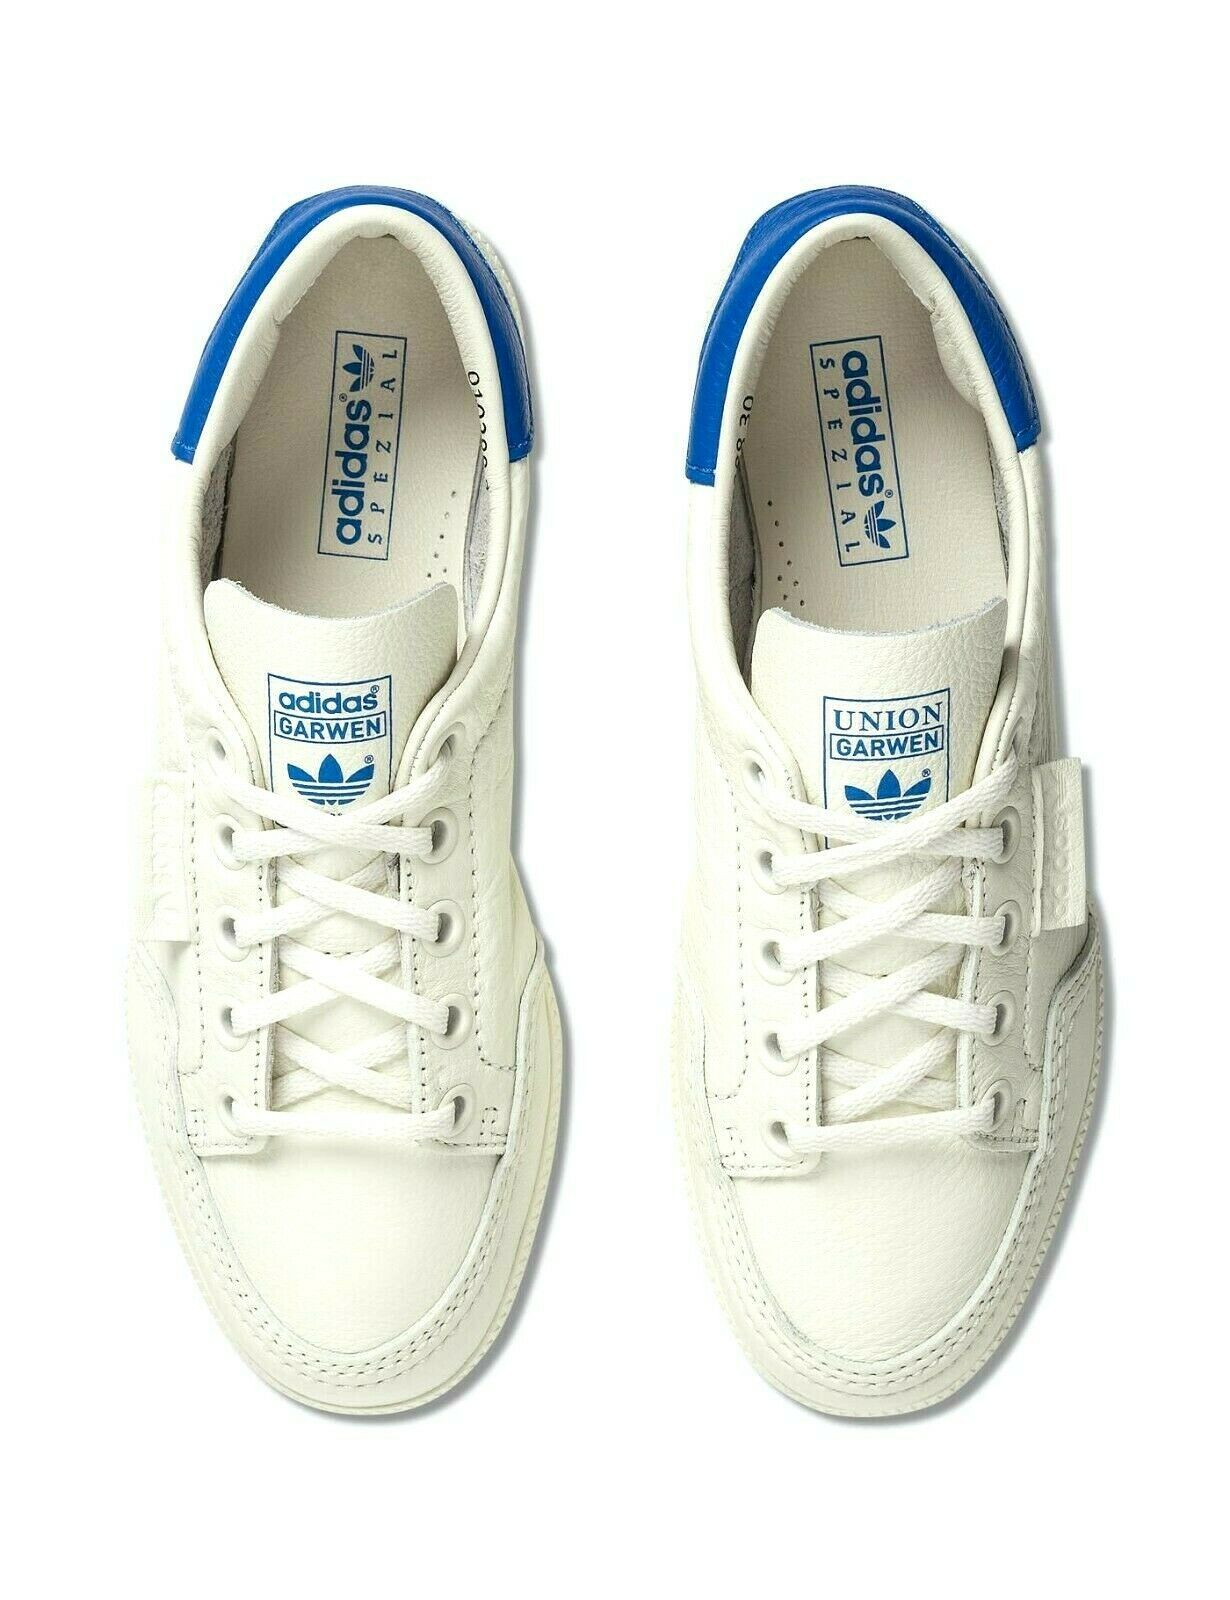 Adidas Originals Spezial Garwen x Union Leather B41825 Mens Sneakers image 3